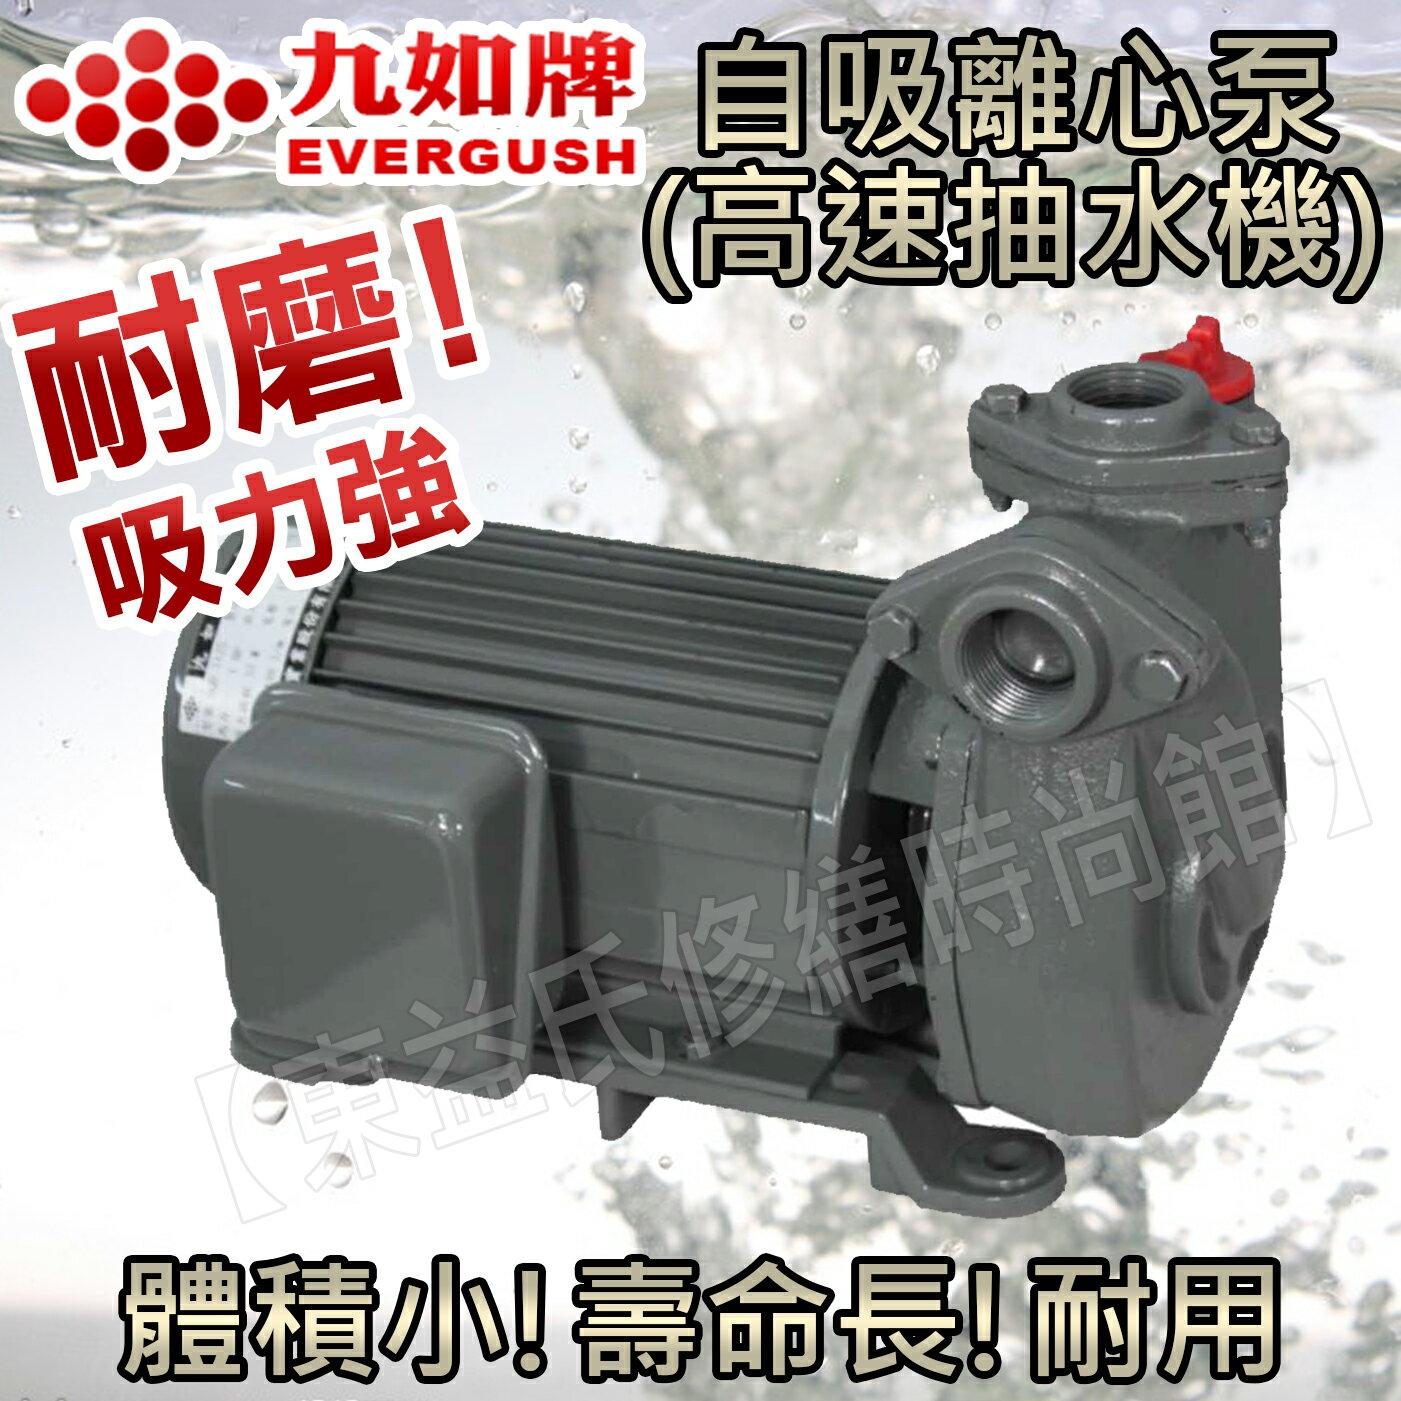 SQD-4125 九如牌1/2 HP 高速抽水馬達 110V/220V通用 【東益氏】售 大井牌 抽水馬達